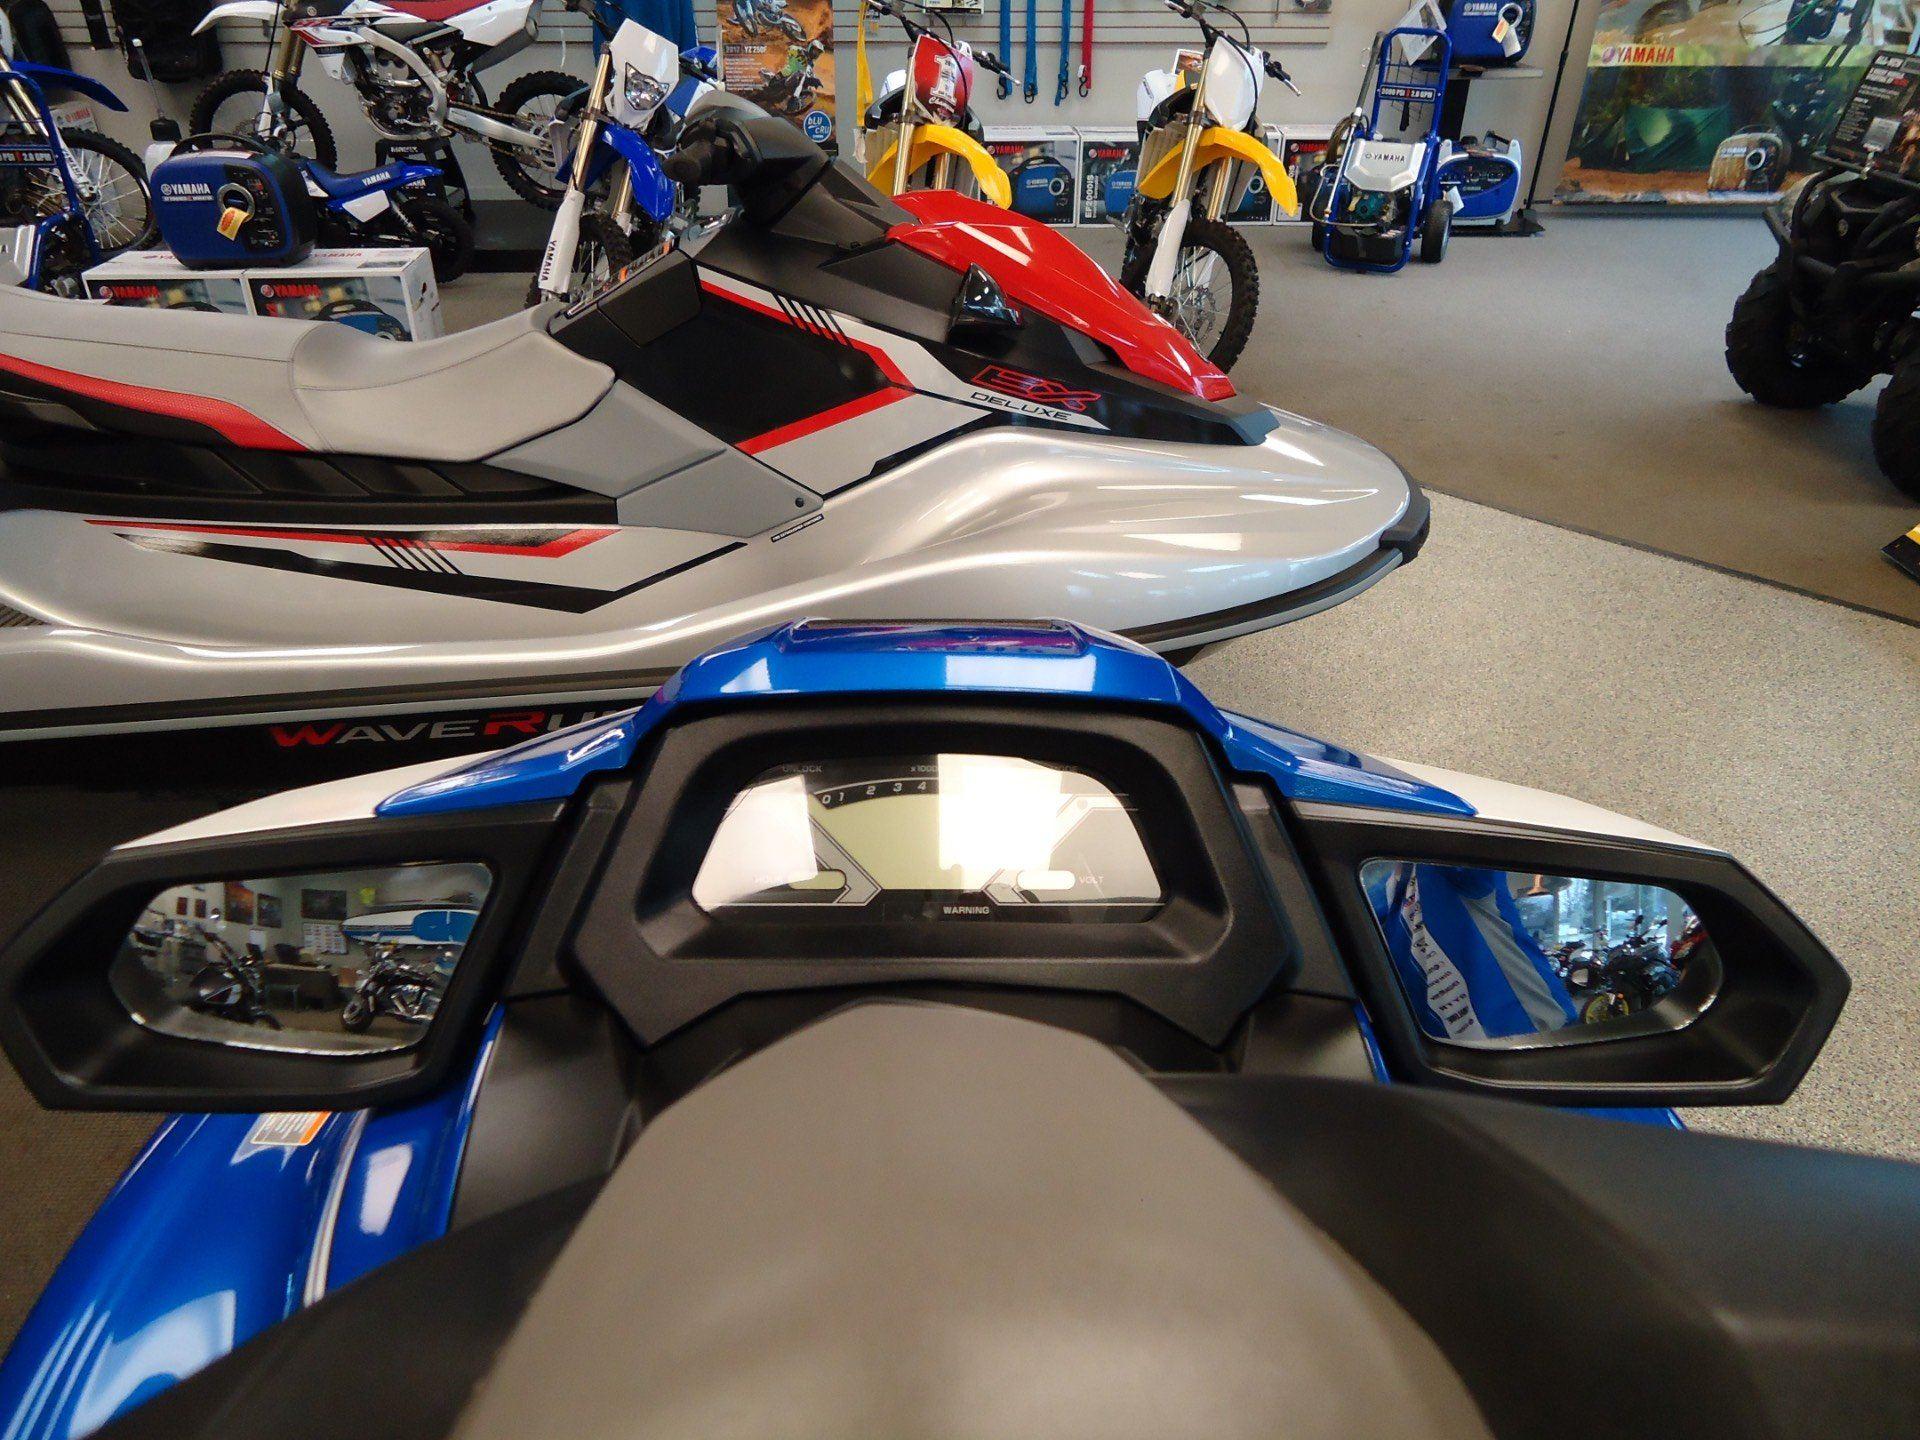 2017 Yamaha VX Limited 8